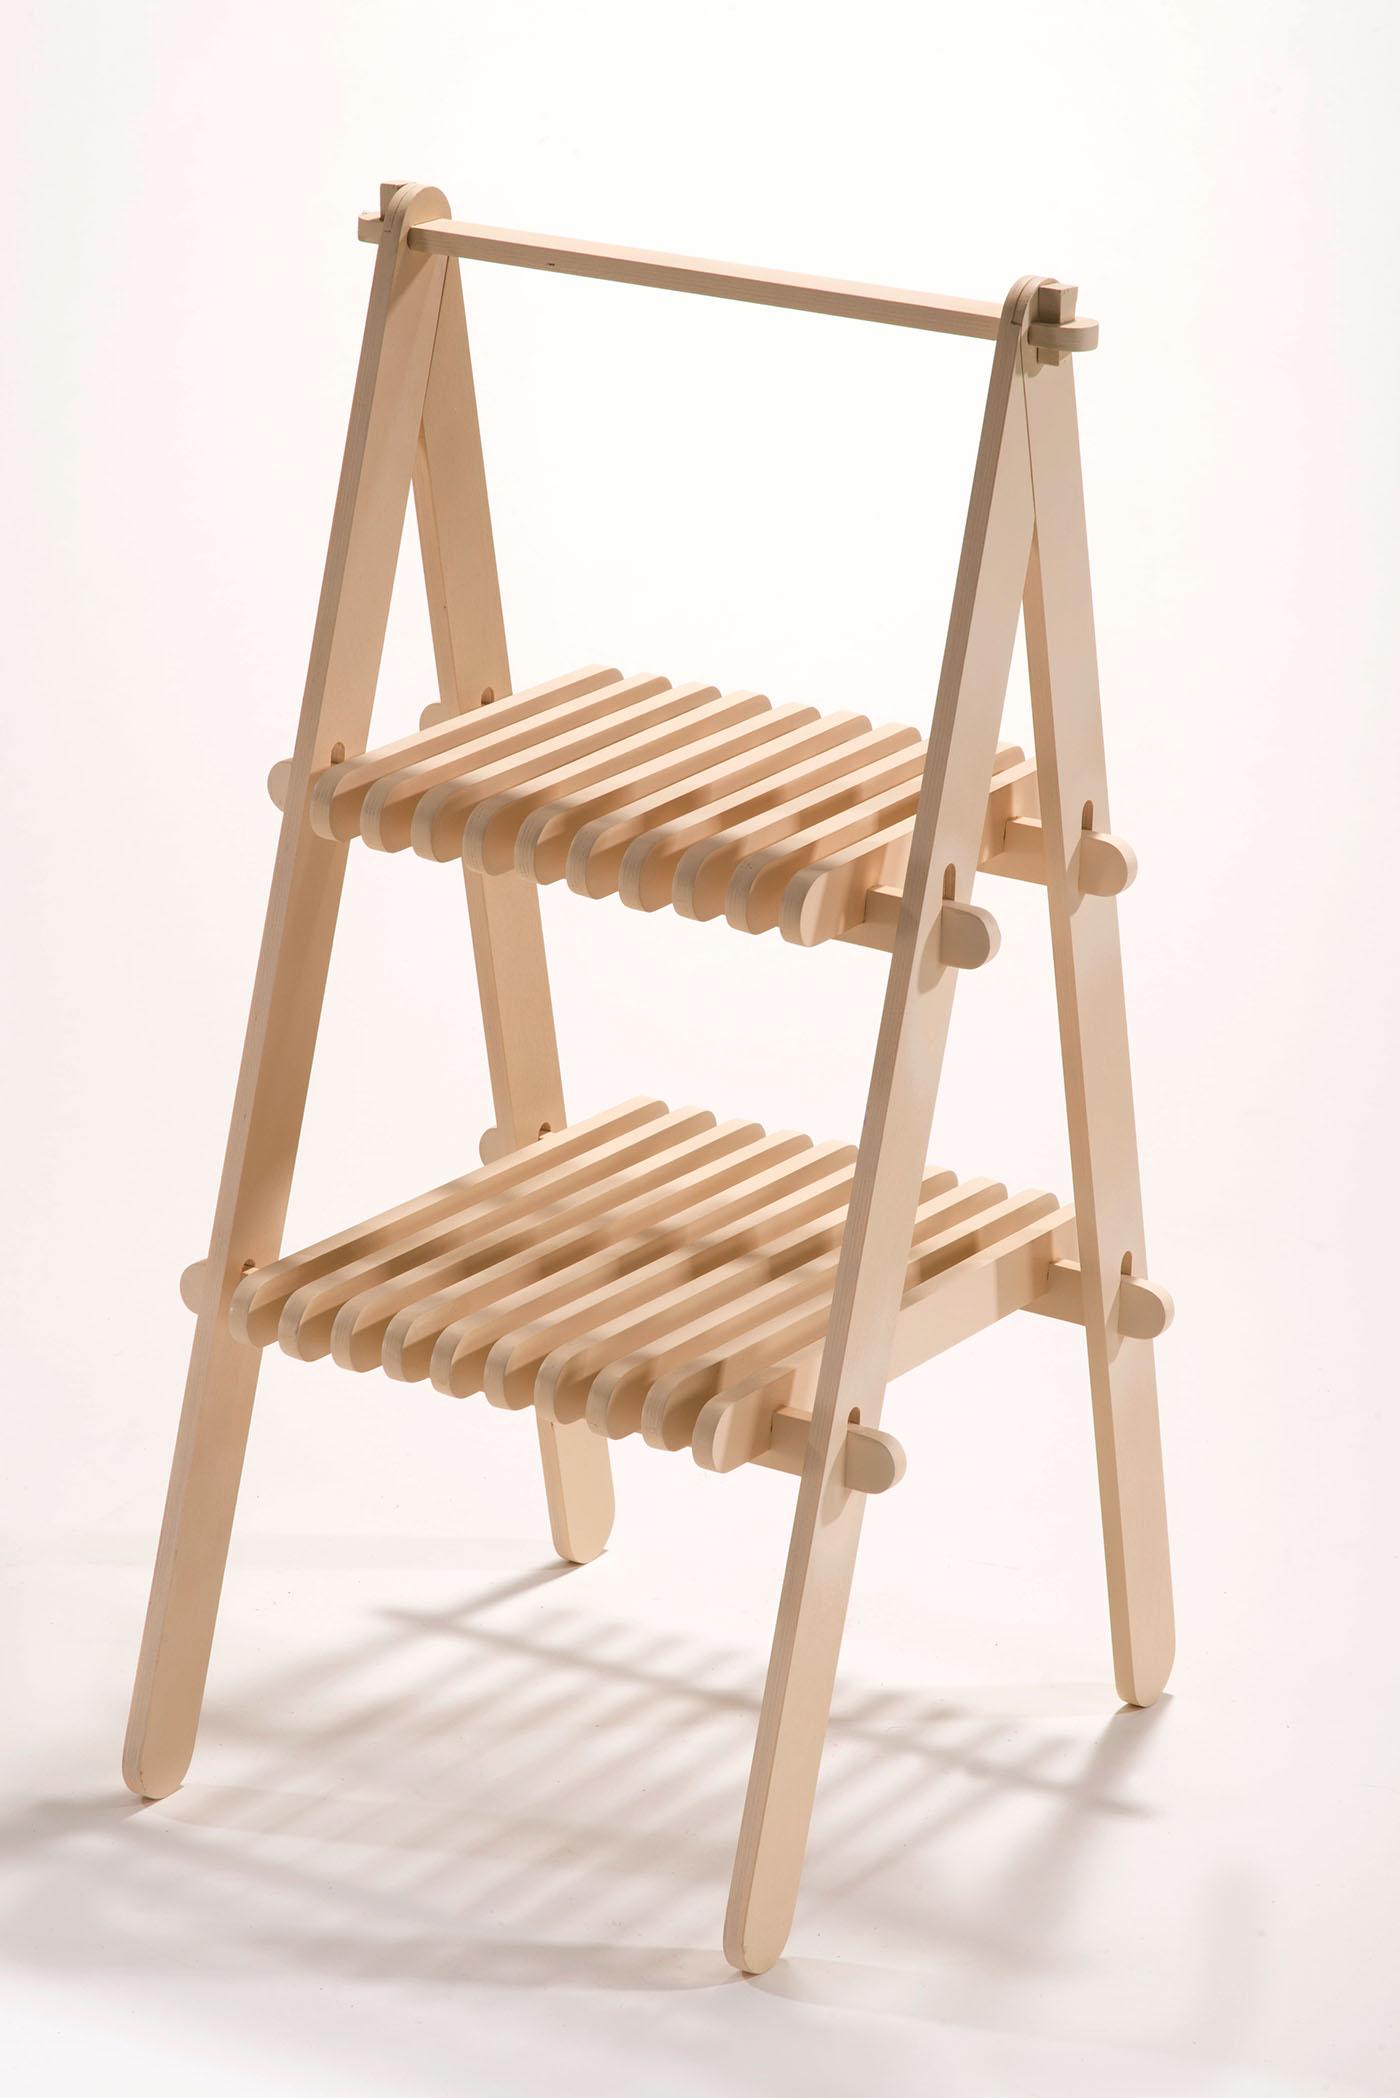 Strange Sophomore Spring Cnc Plywood Step Stool On Behance Ibusinesslaw Wood Chair Design Ideas Ibusinesslaworg